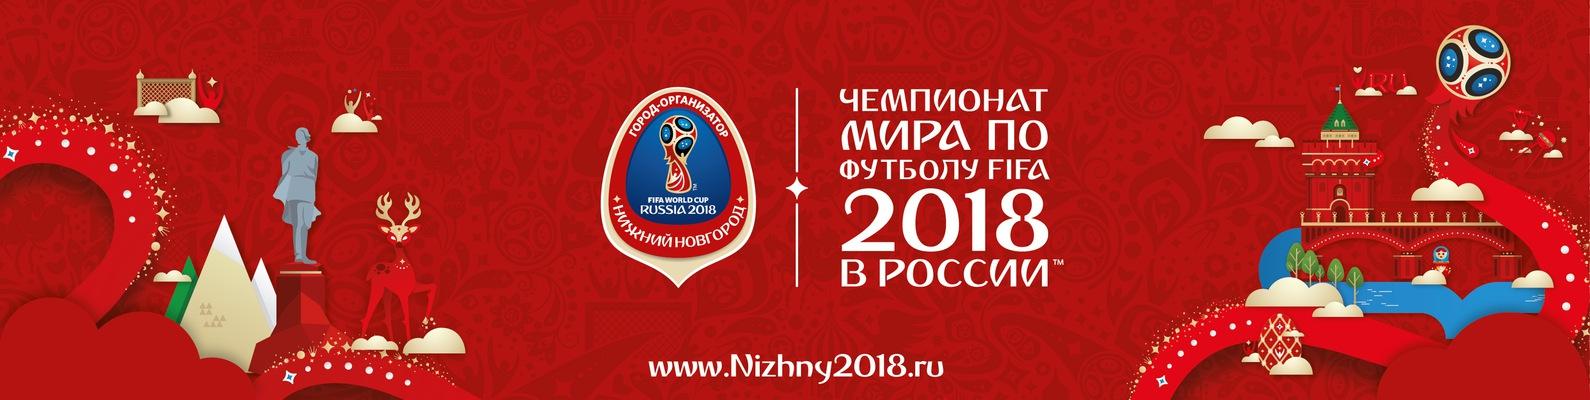 мира новгород футболу будете чемпионат по не нижний 2018